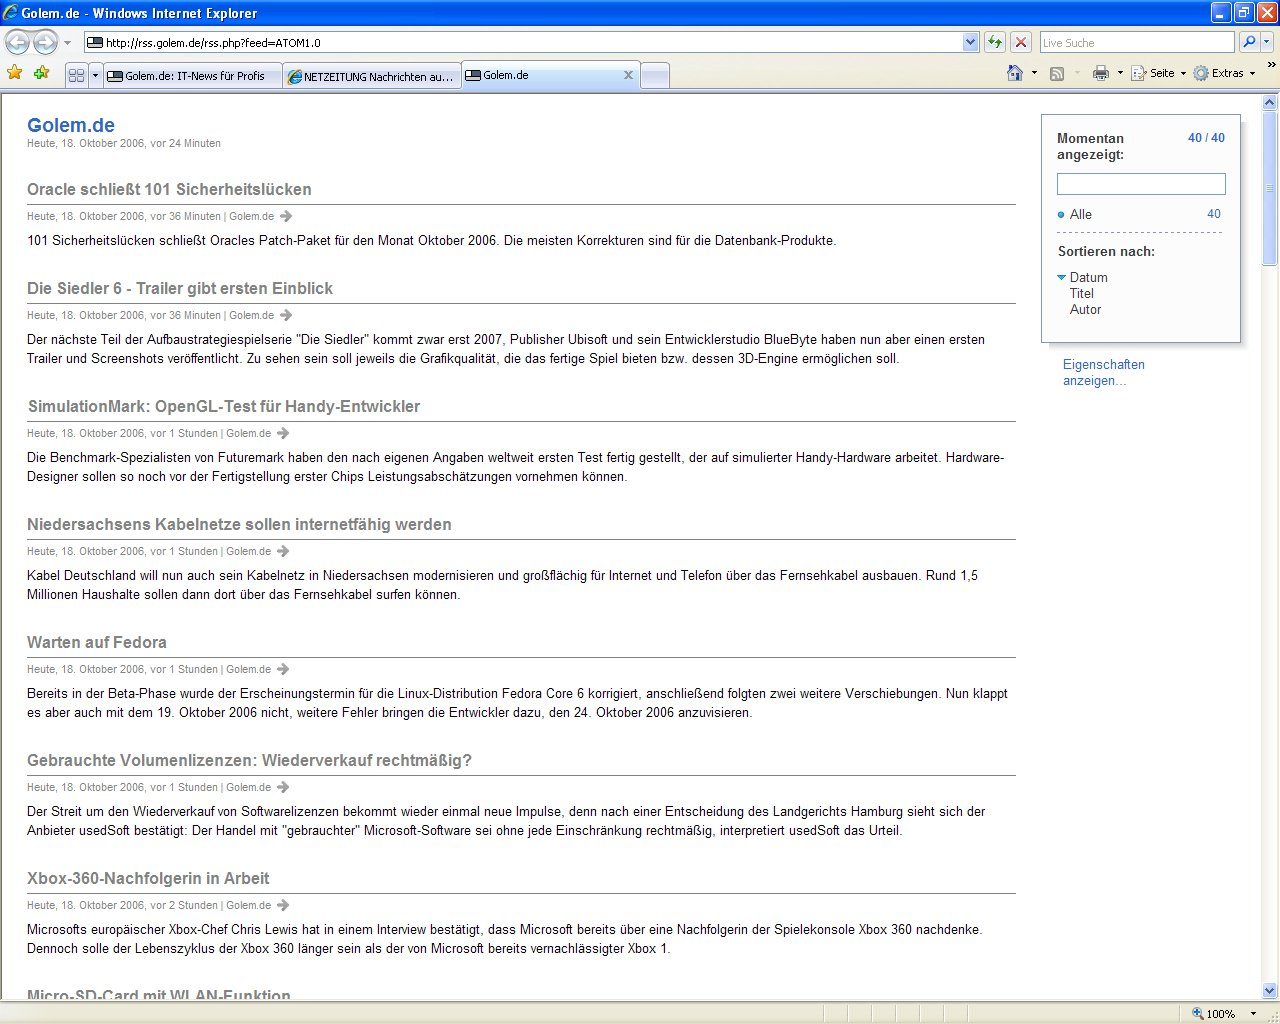 Internet Explorer 7 kommt nun automatisch